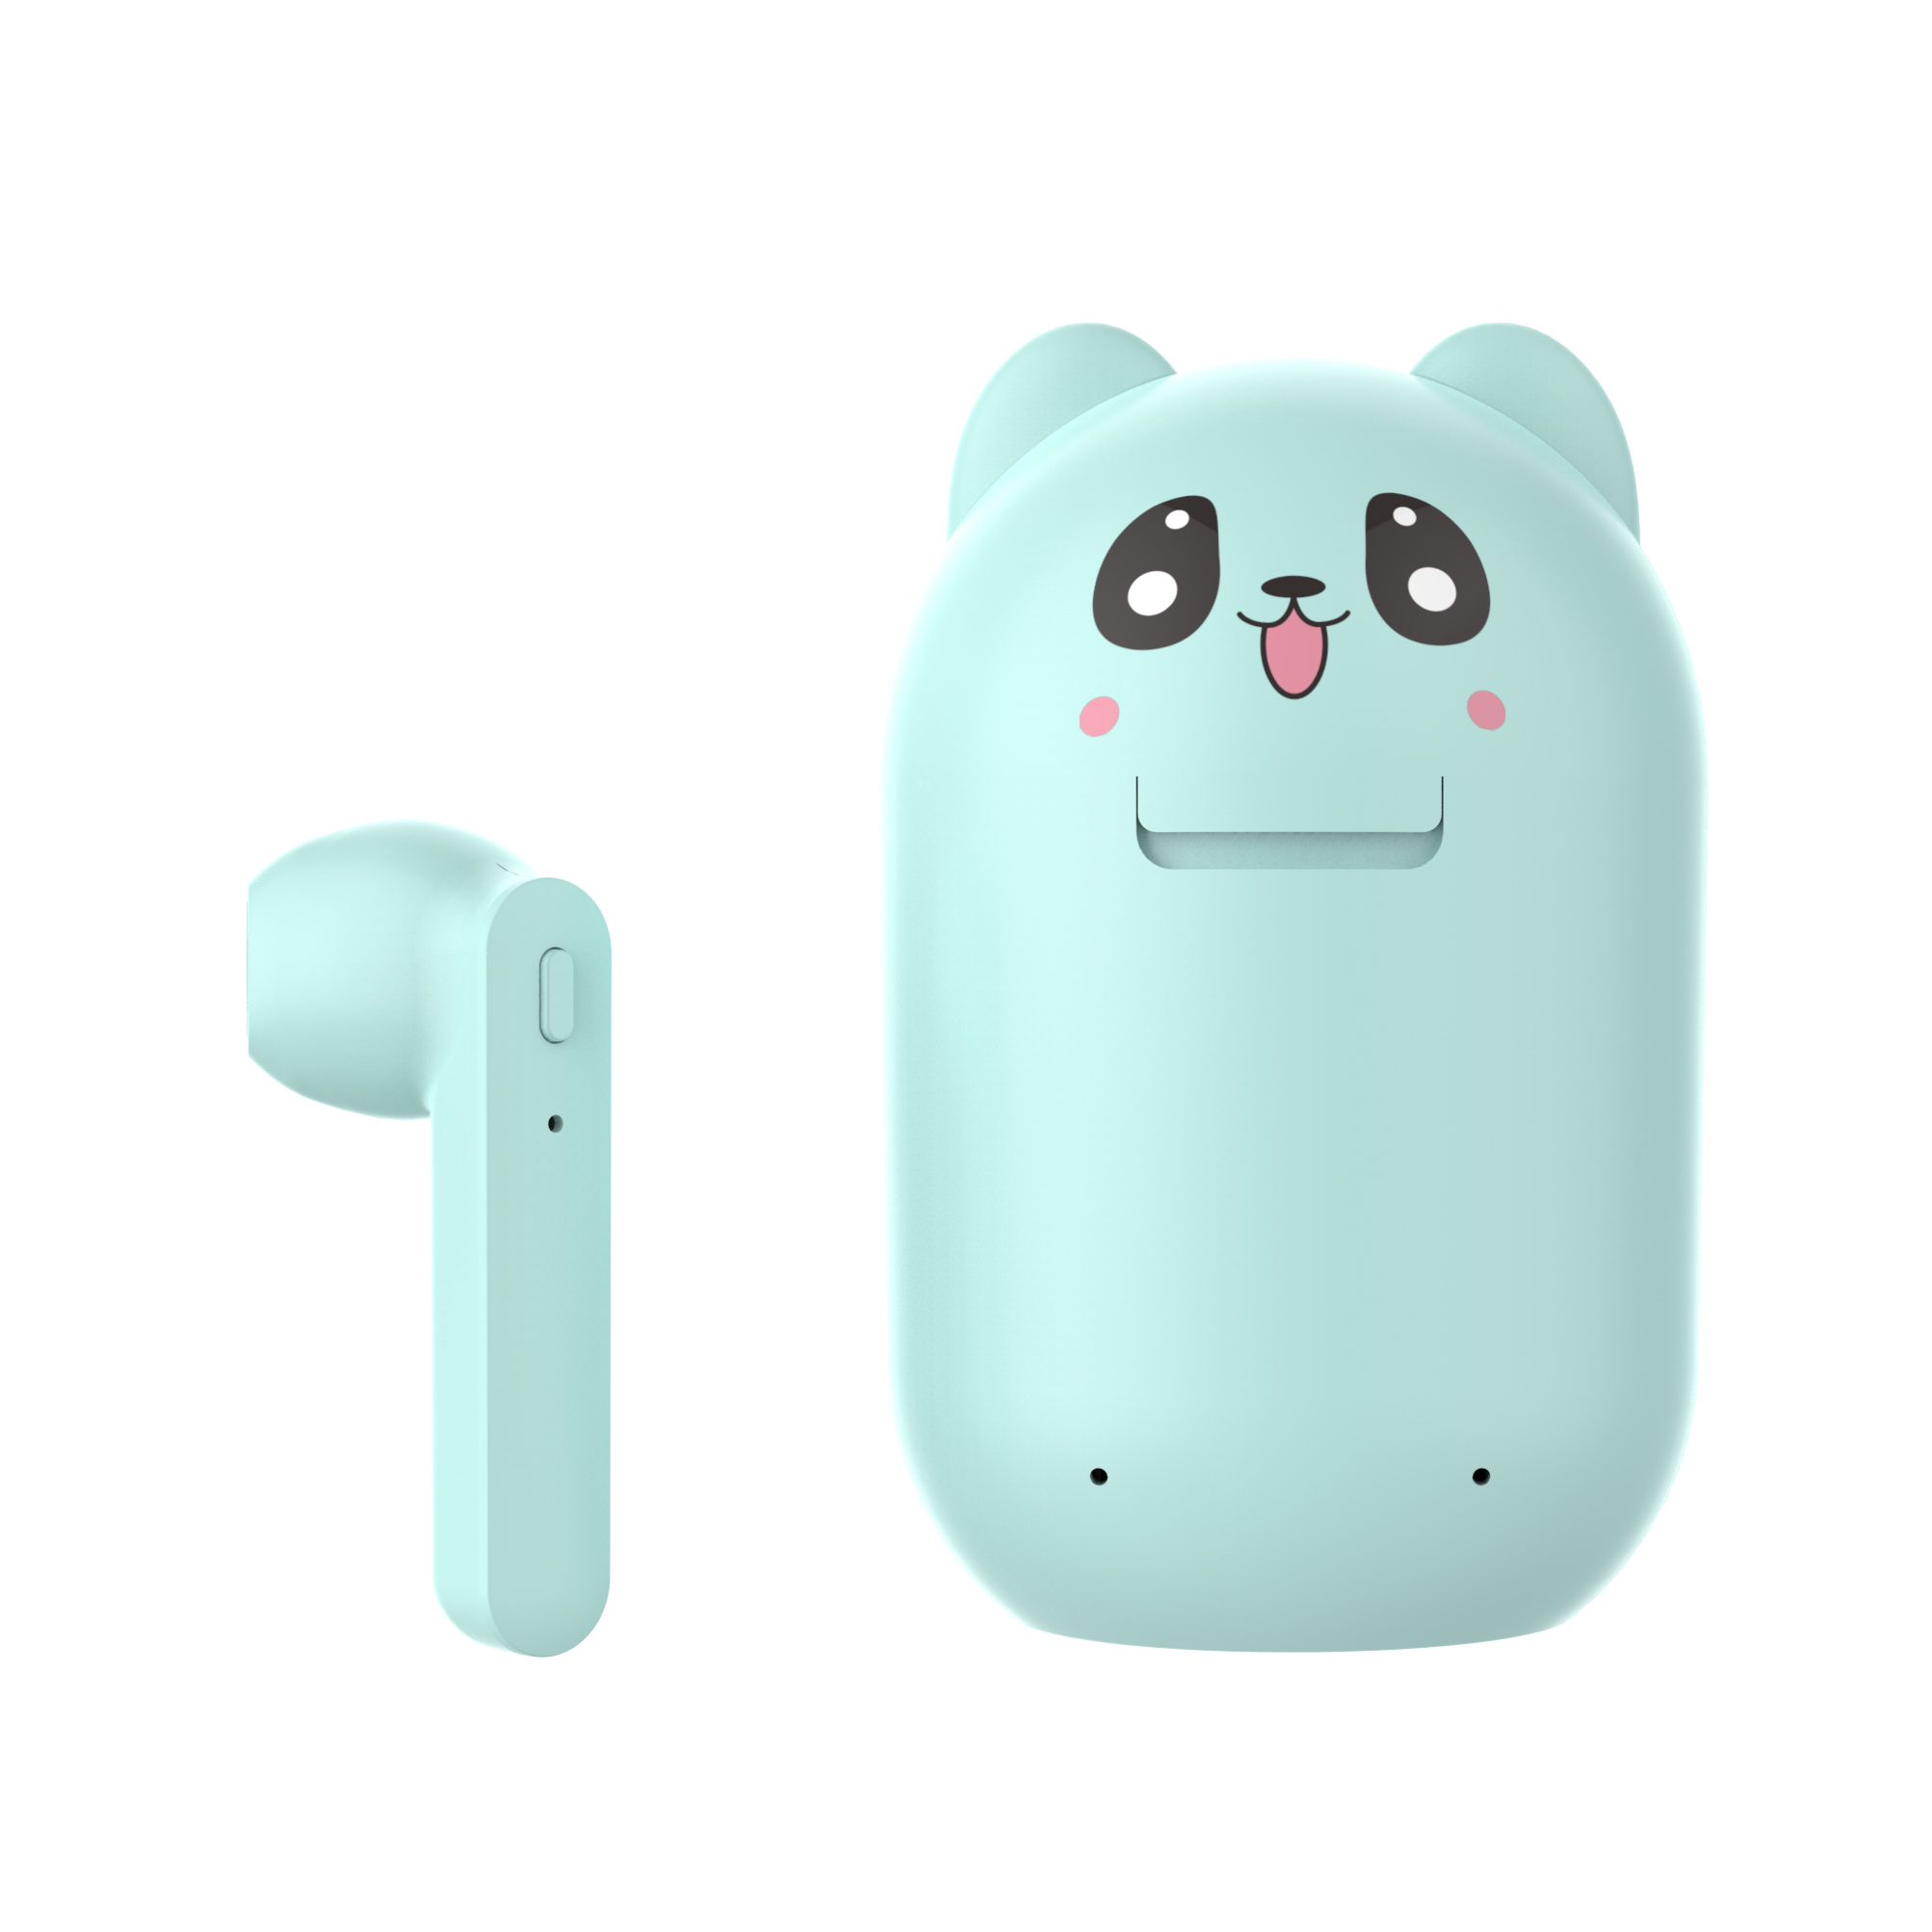 TWS Bluetooth Earphone 5.0 Running Stereo Cartoon Headset with Data Line blue